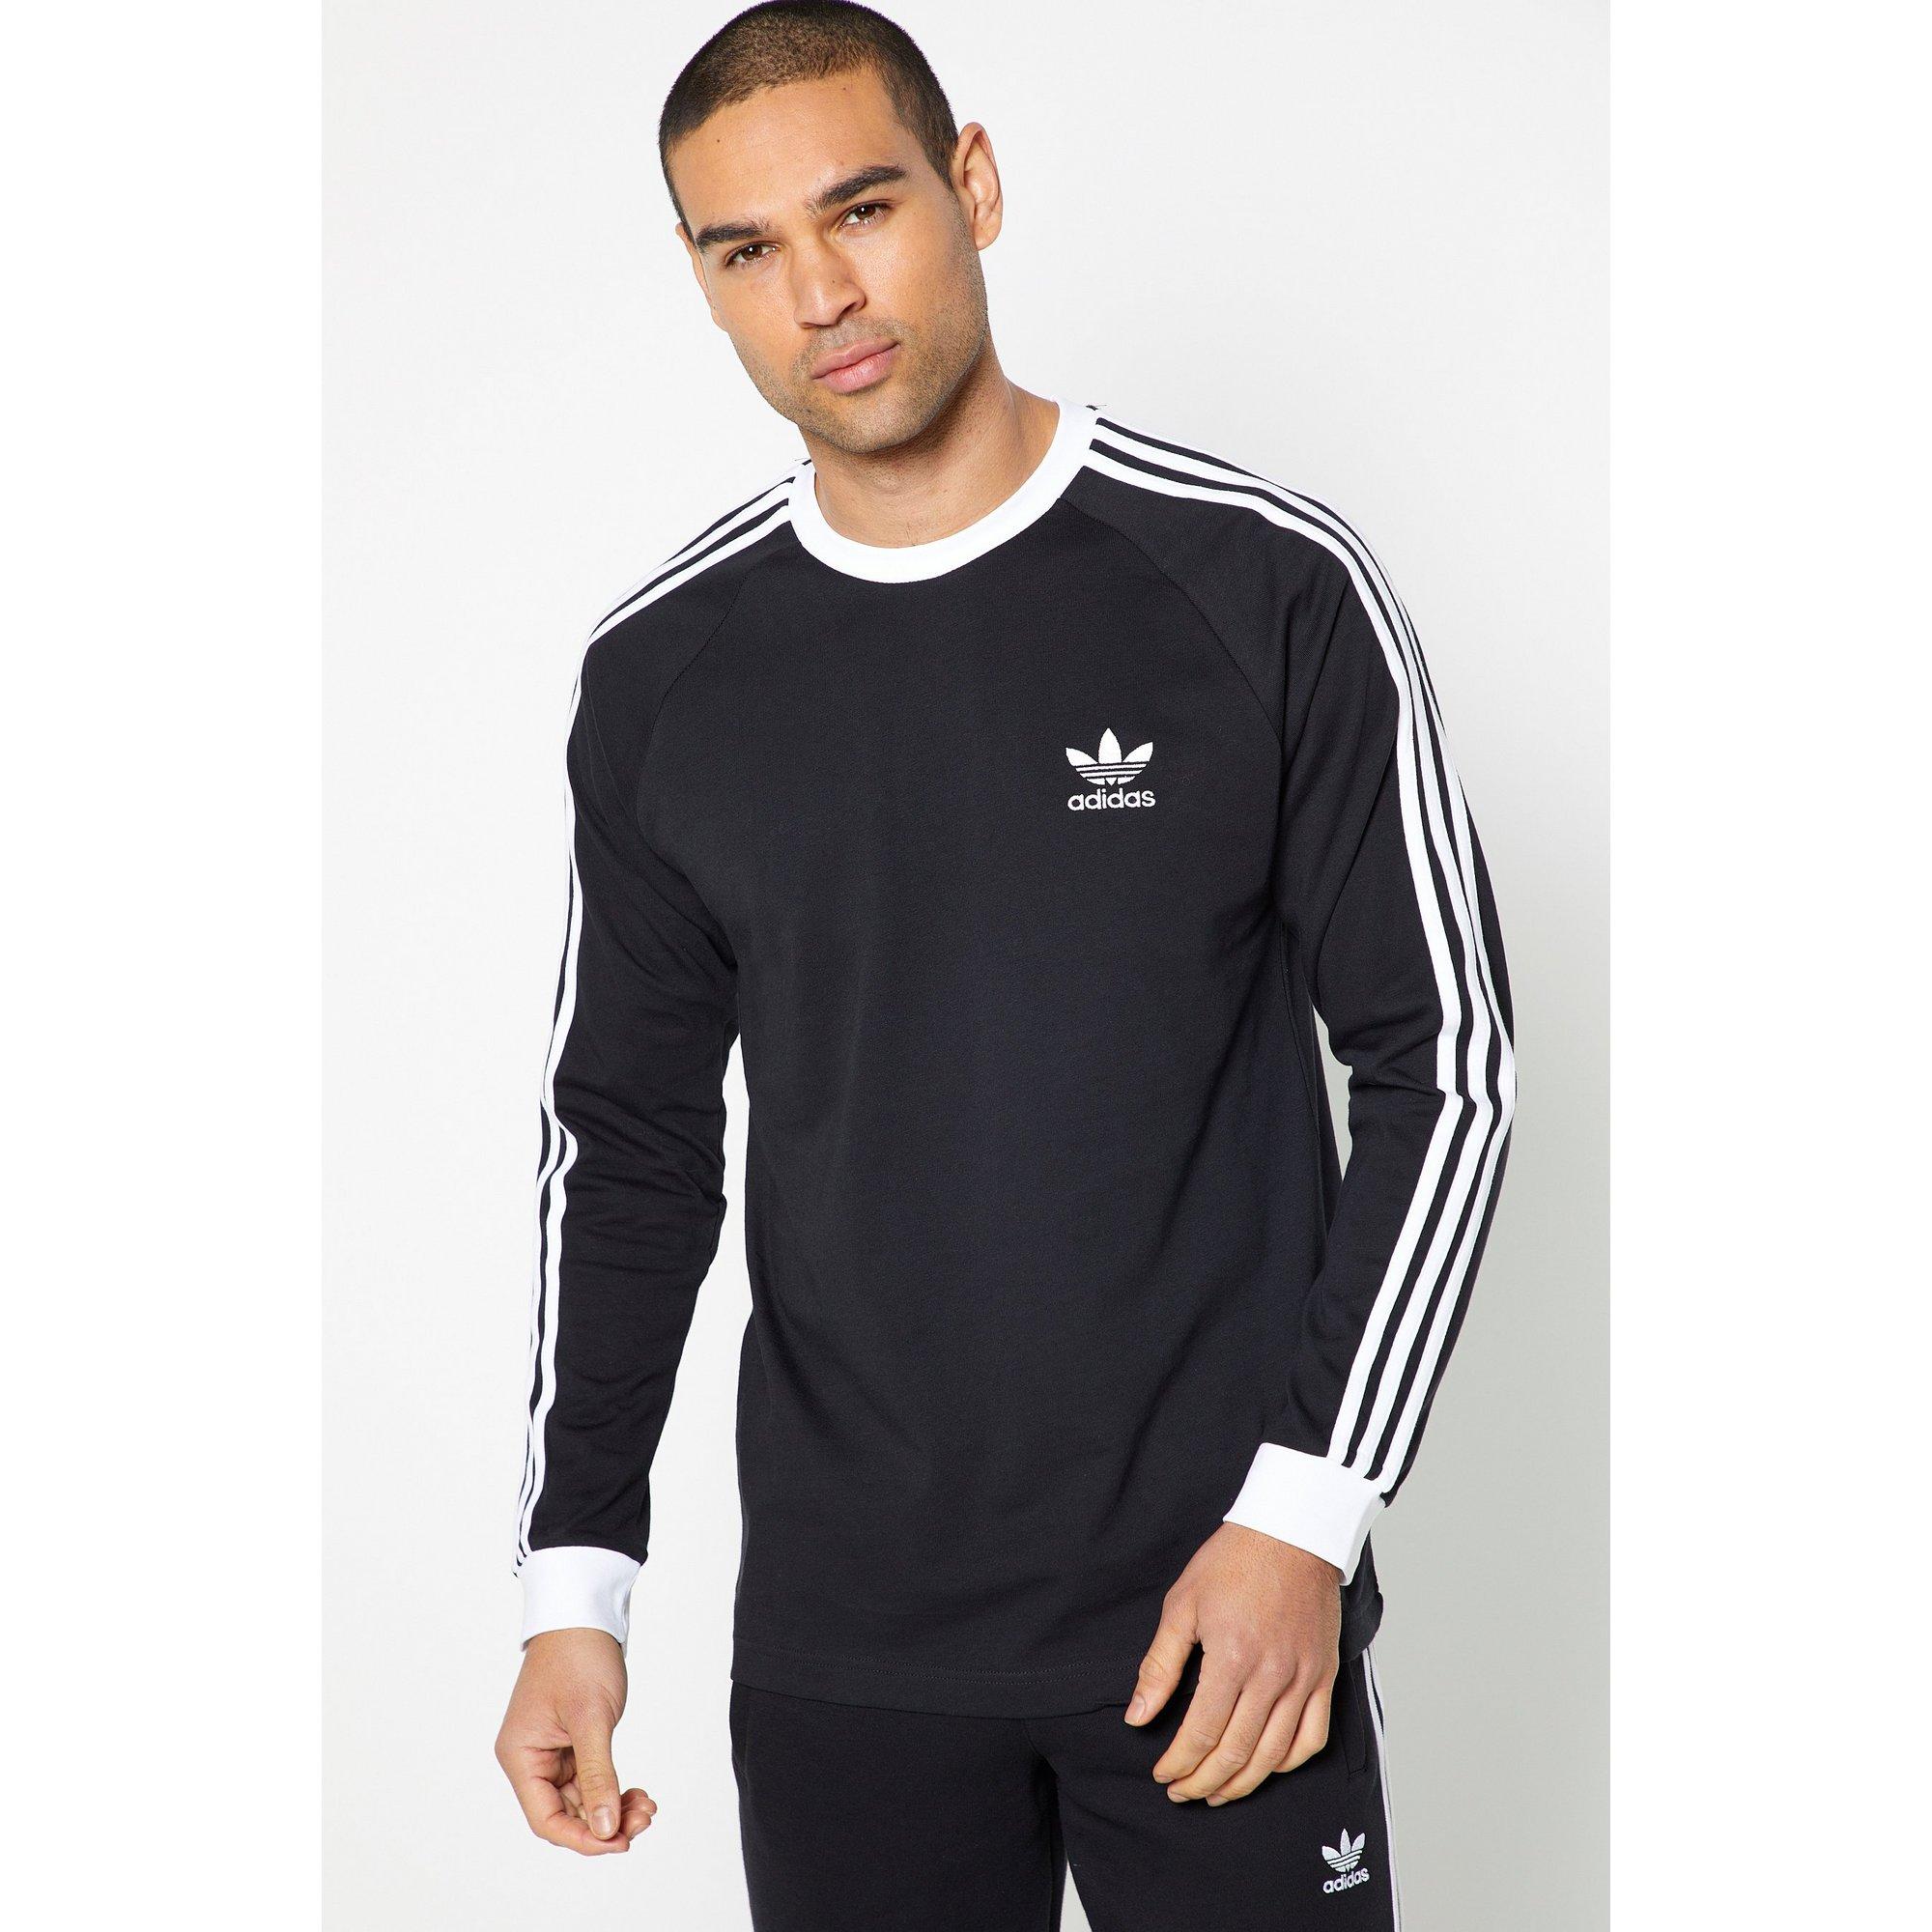 Image of adidas Originals 3 Stripes Long Sleeve Black T-Shirt